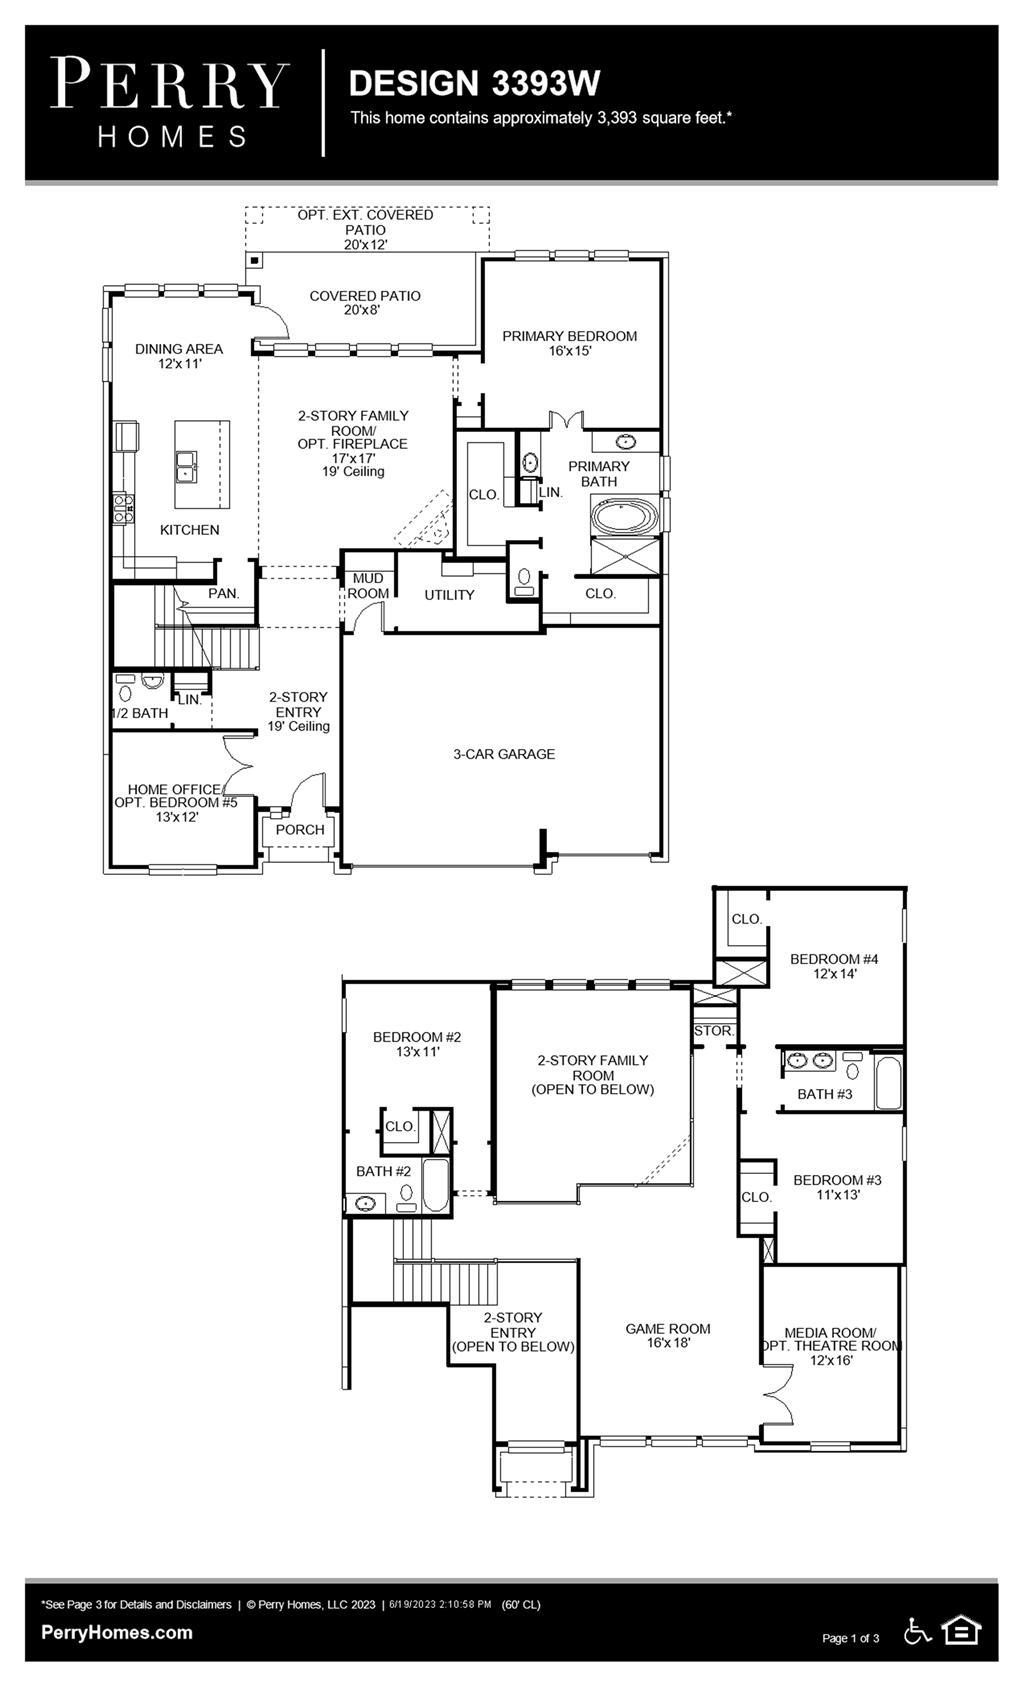 Floor Plan for 3393W